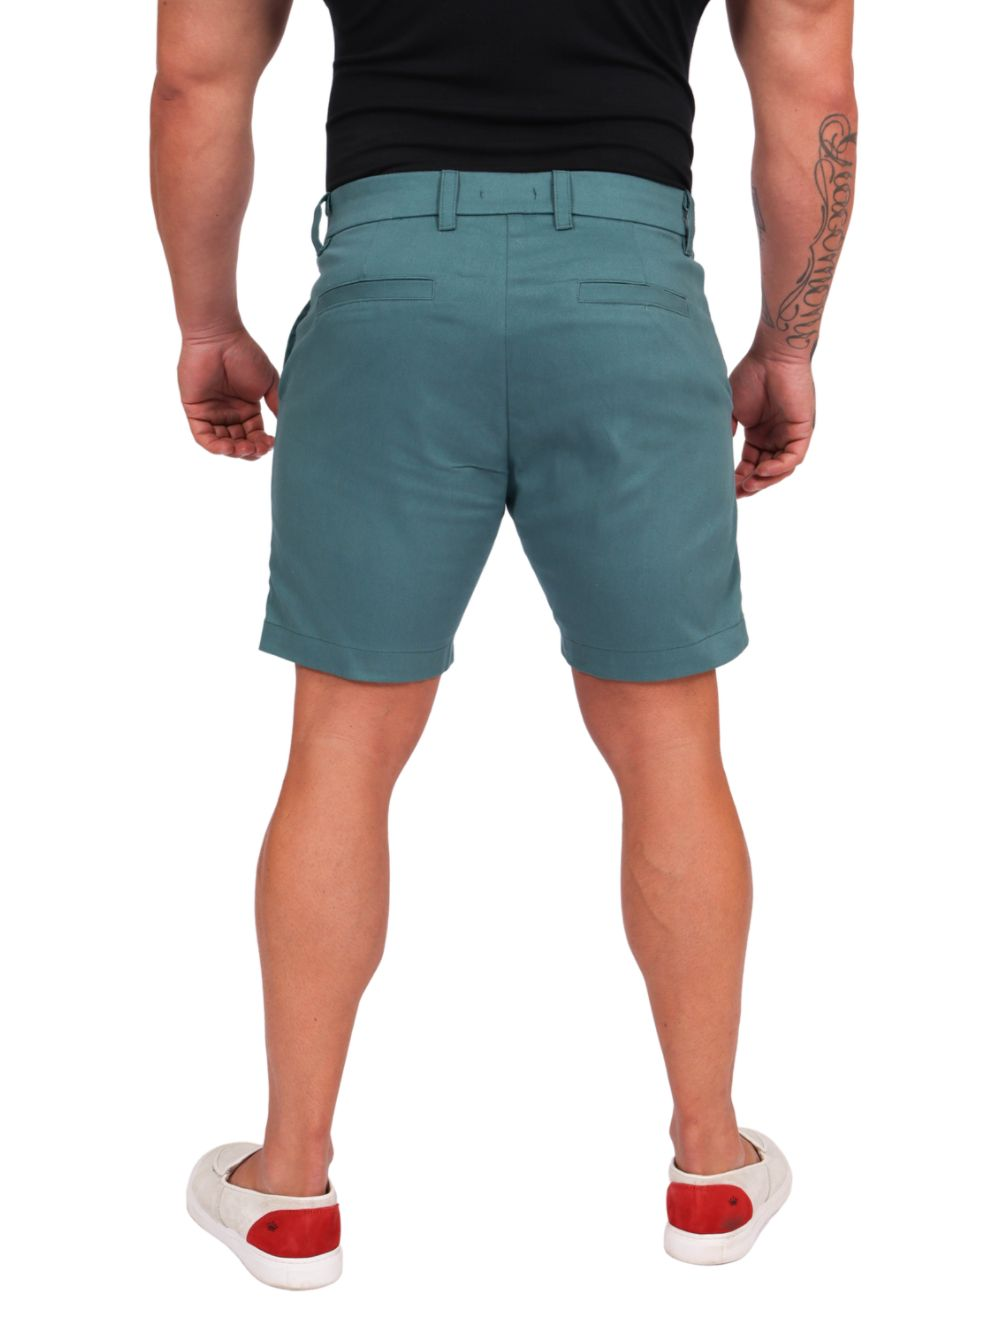 Bermuda Masculina Sarja com elastano Azul Petróleo